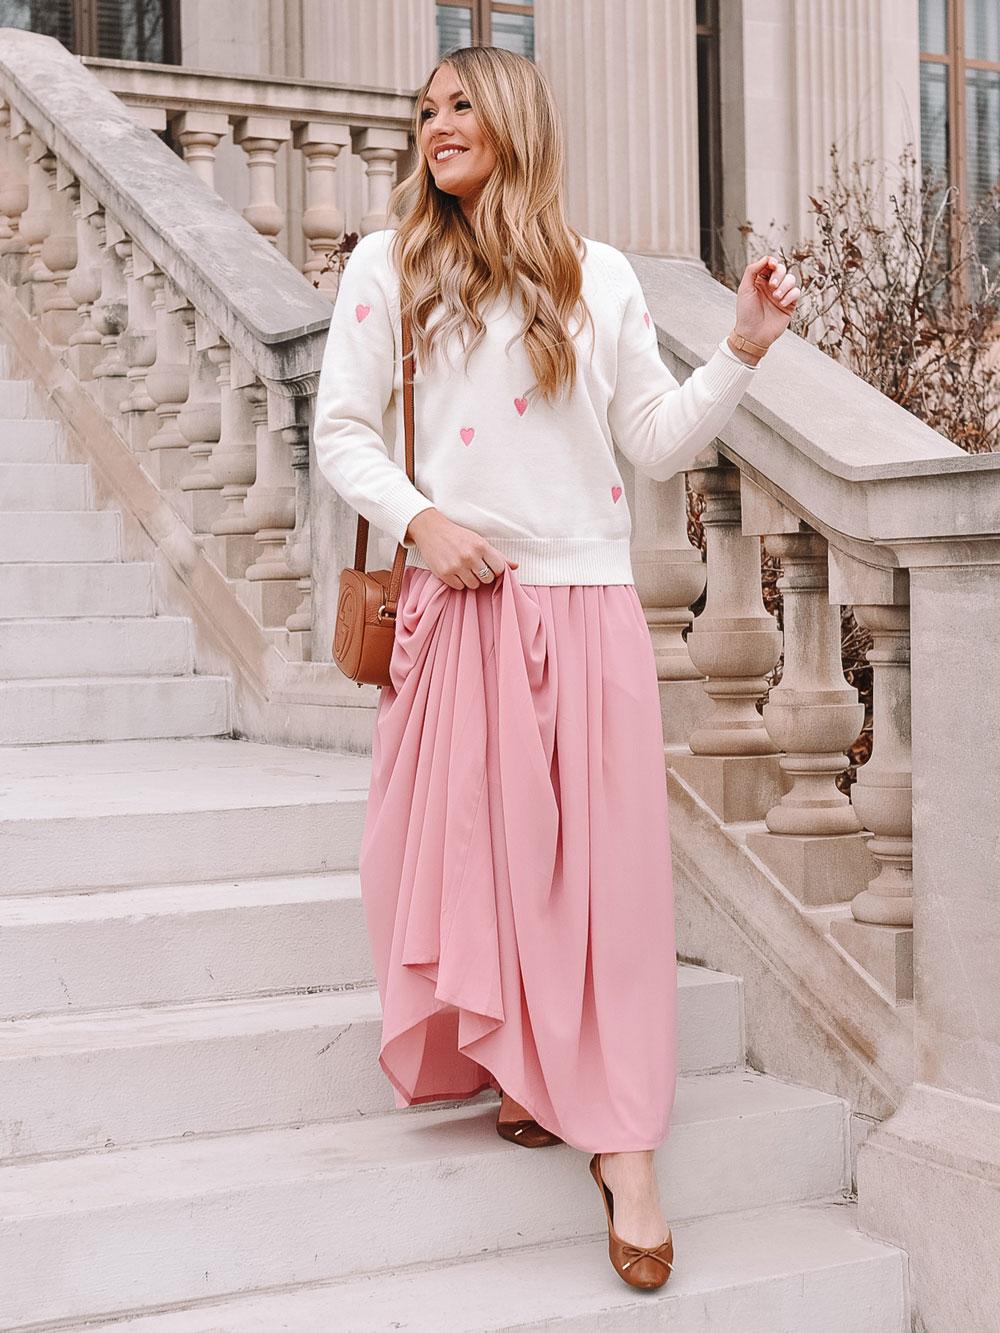 Amanda Martin of Amanda's OK Shares Valentine's Day outfit inspo